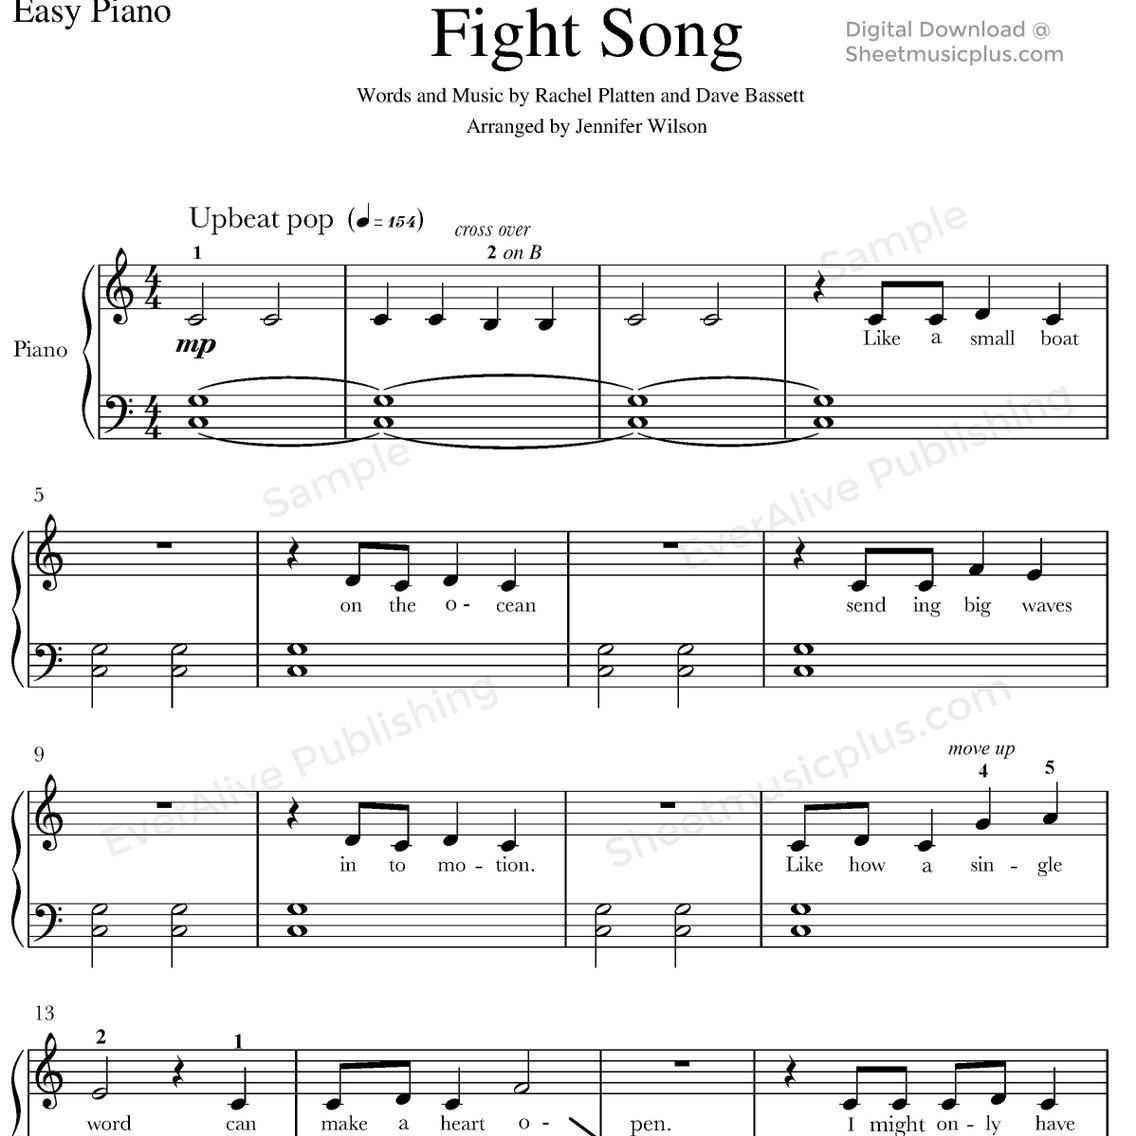 Pindayana Dayana1971 On Sheet Music In 2019 | Easy Piano Sheet - Free Piano Sheet Music Online Printable Popular Songs